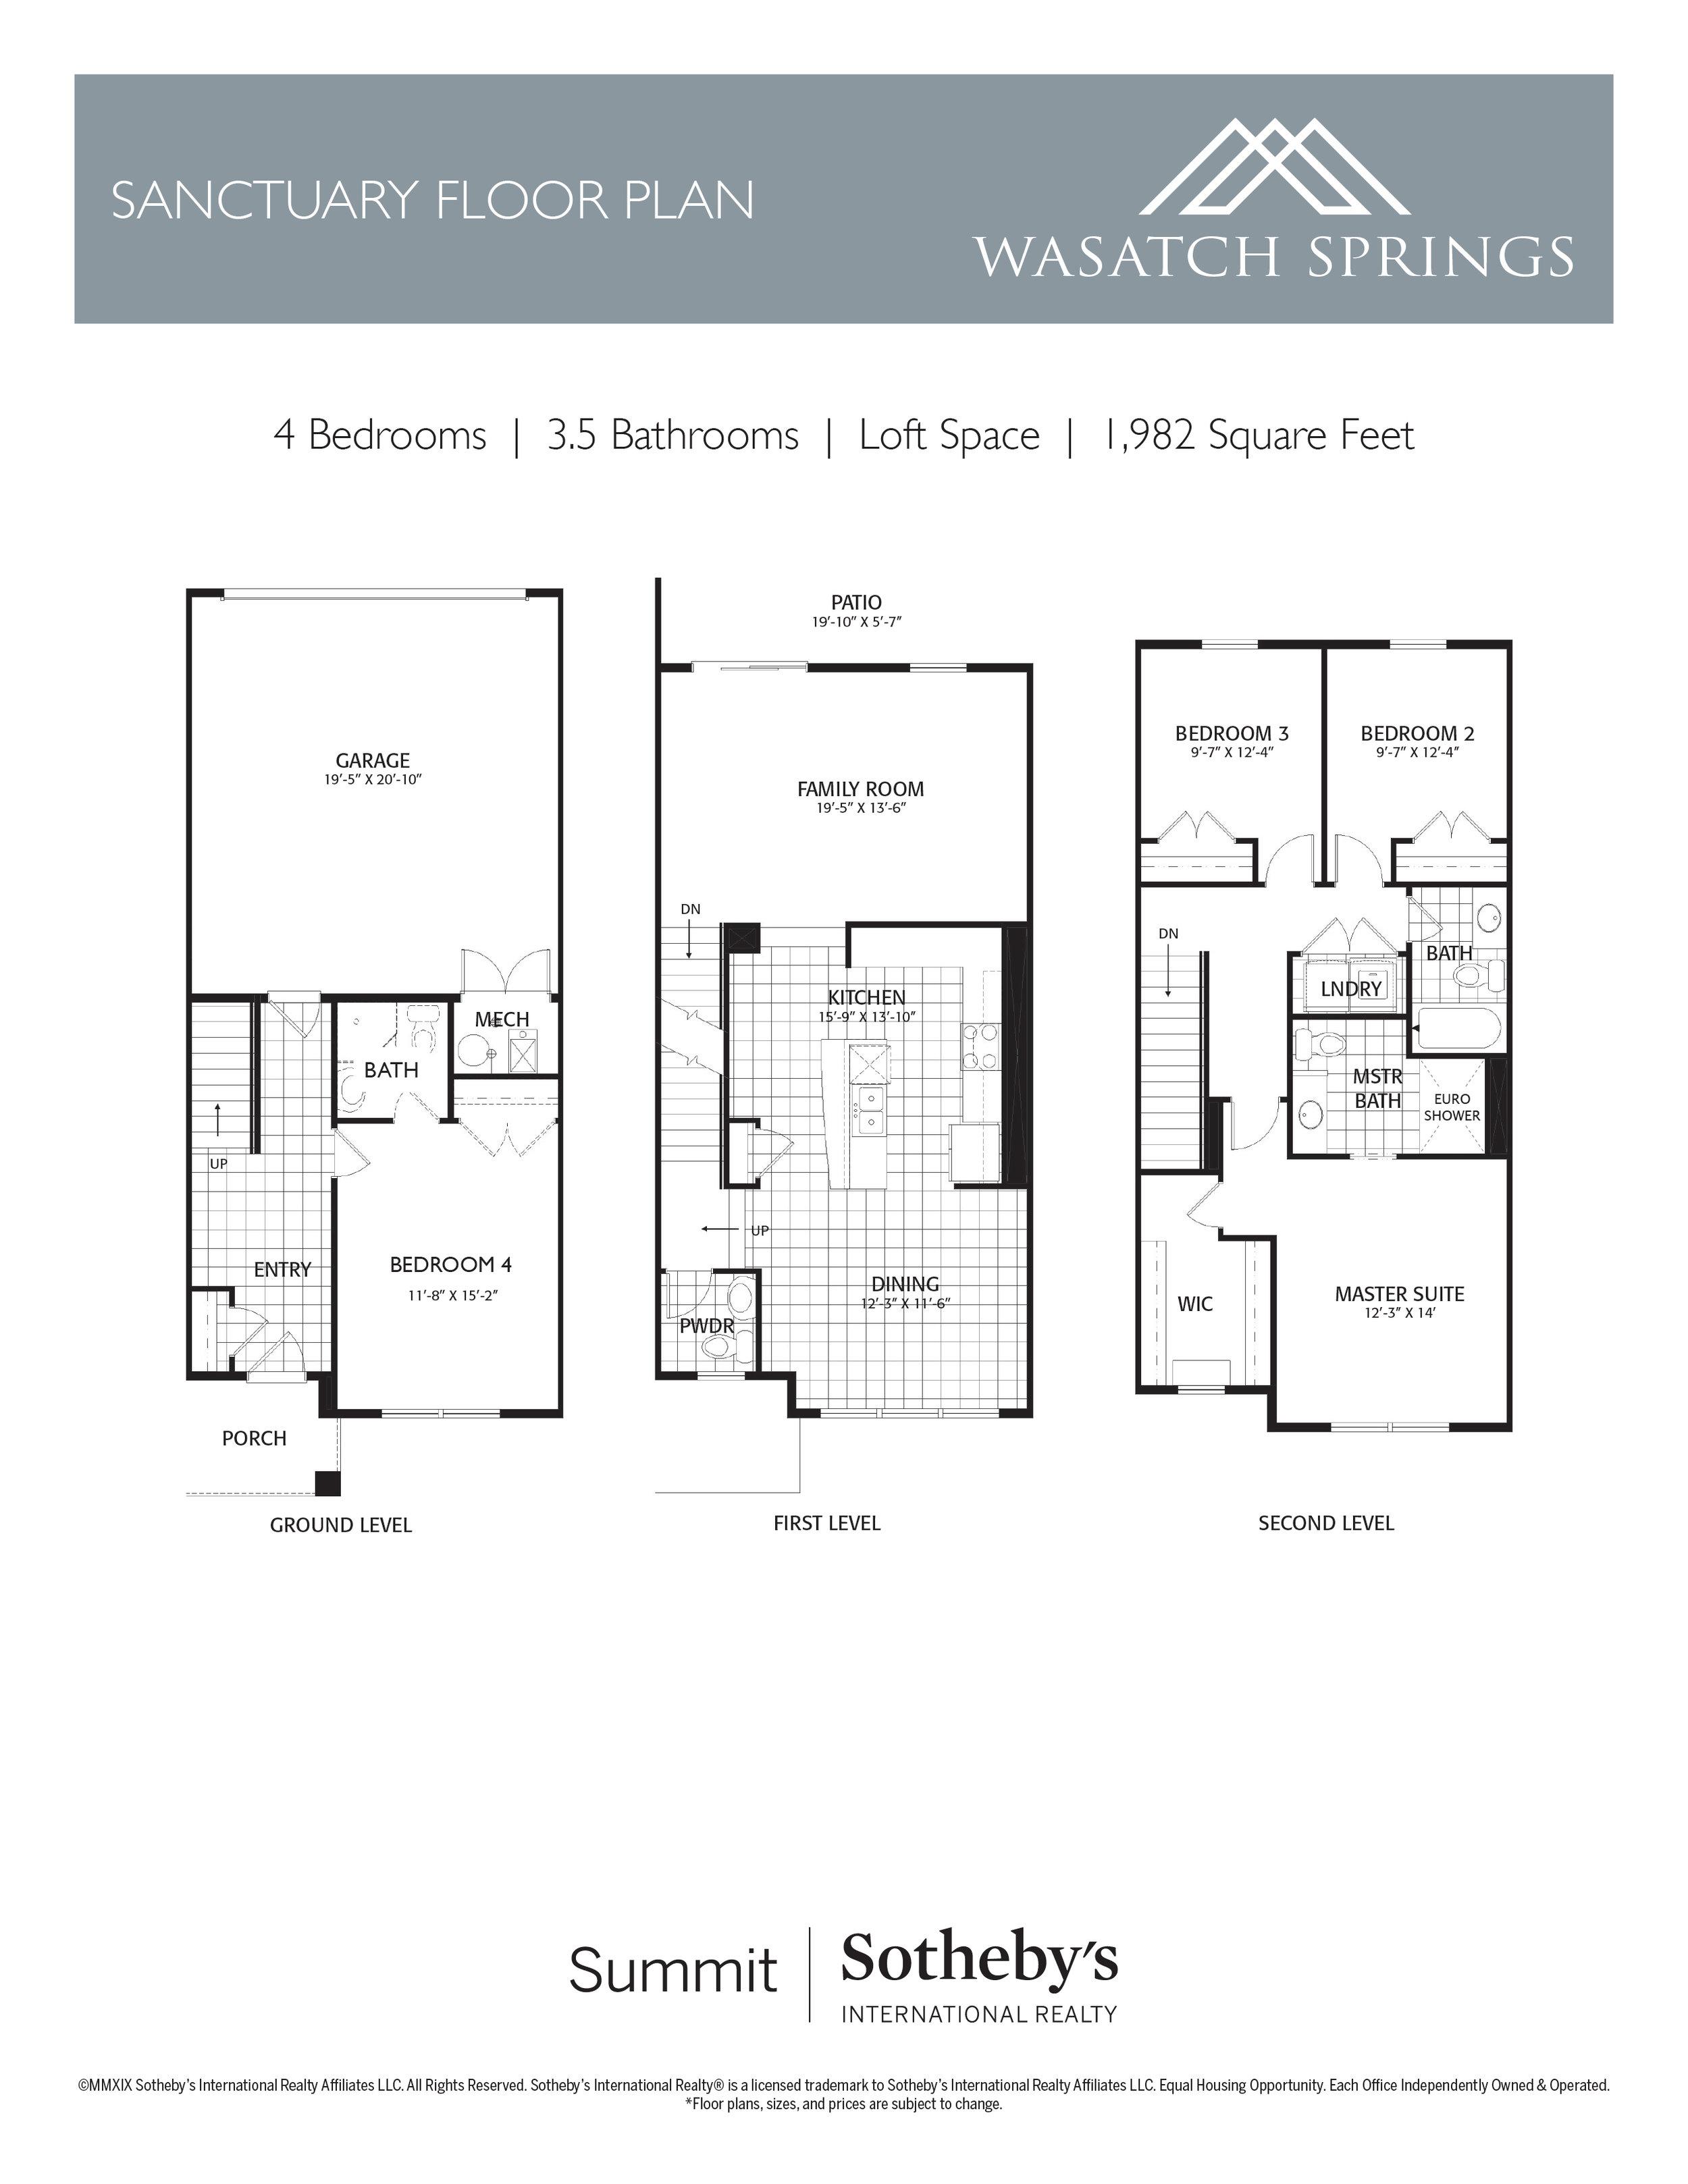 Sanctuary Floor Plan.jpg